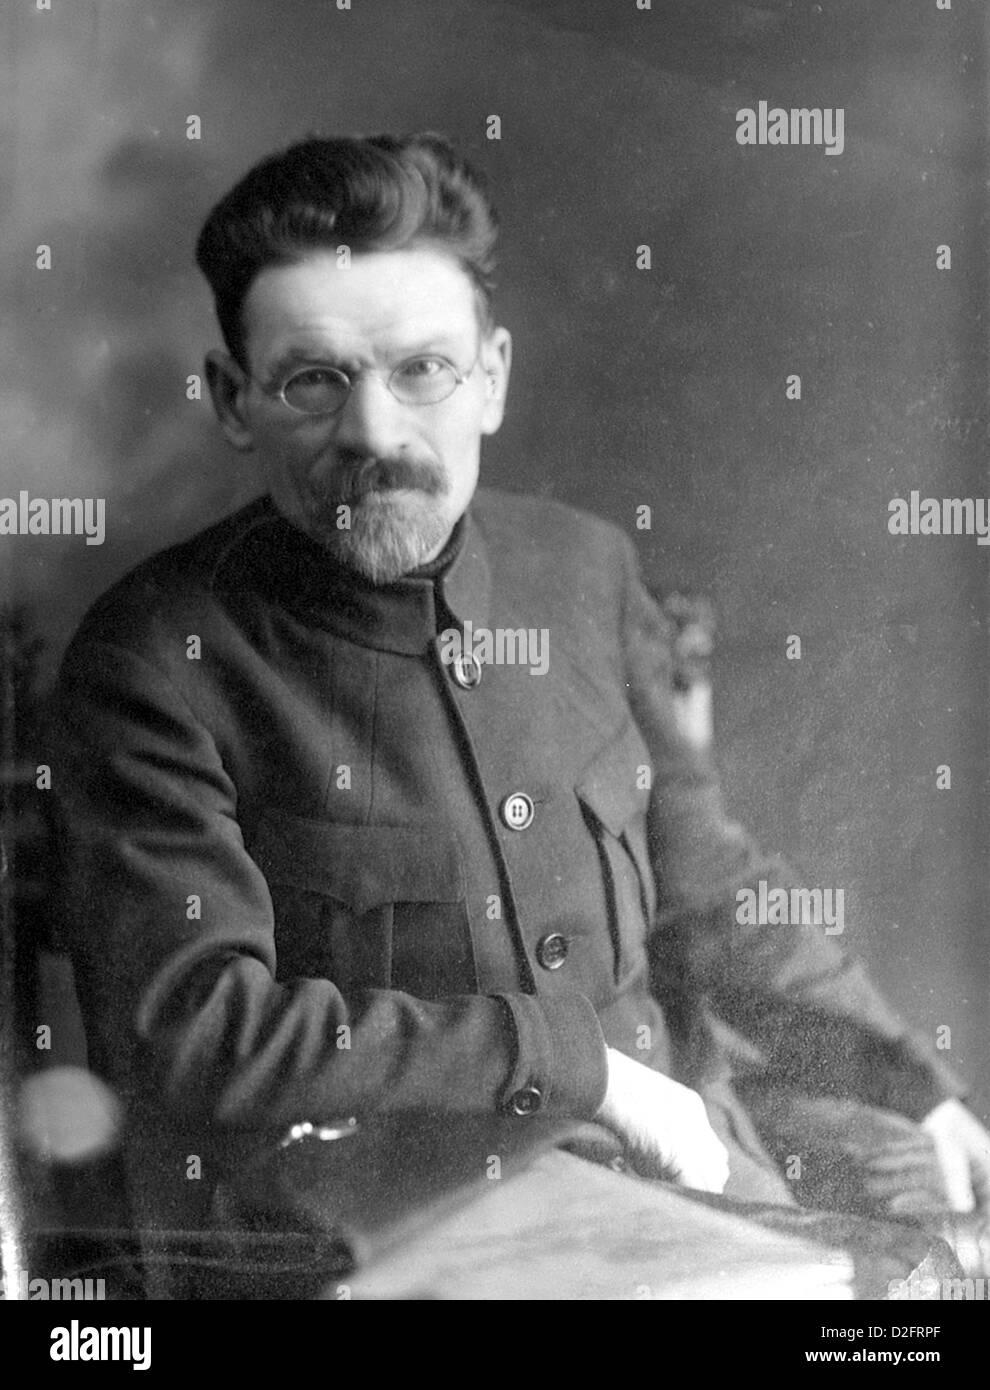 MIKHAIL KALININ (1875-1946) Russian Bolshevik revolutionary about 1920 - Stock Image